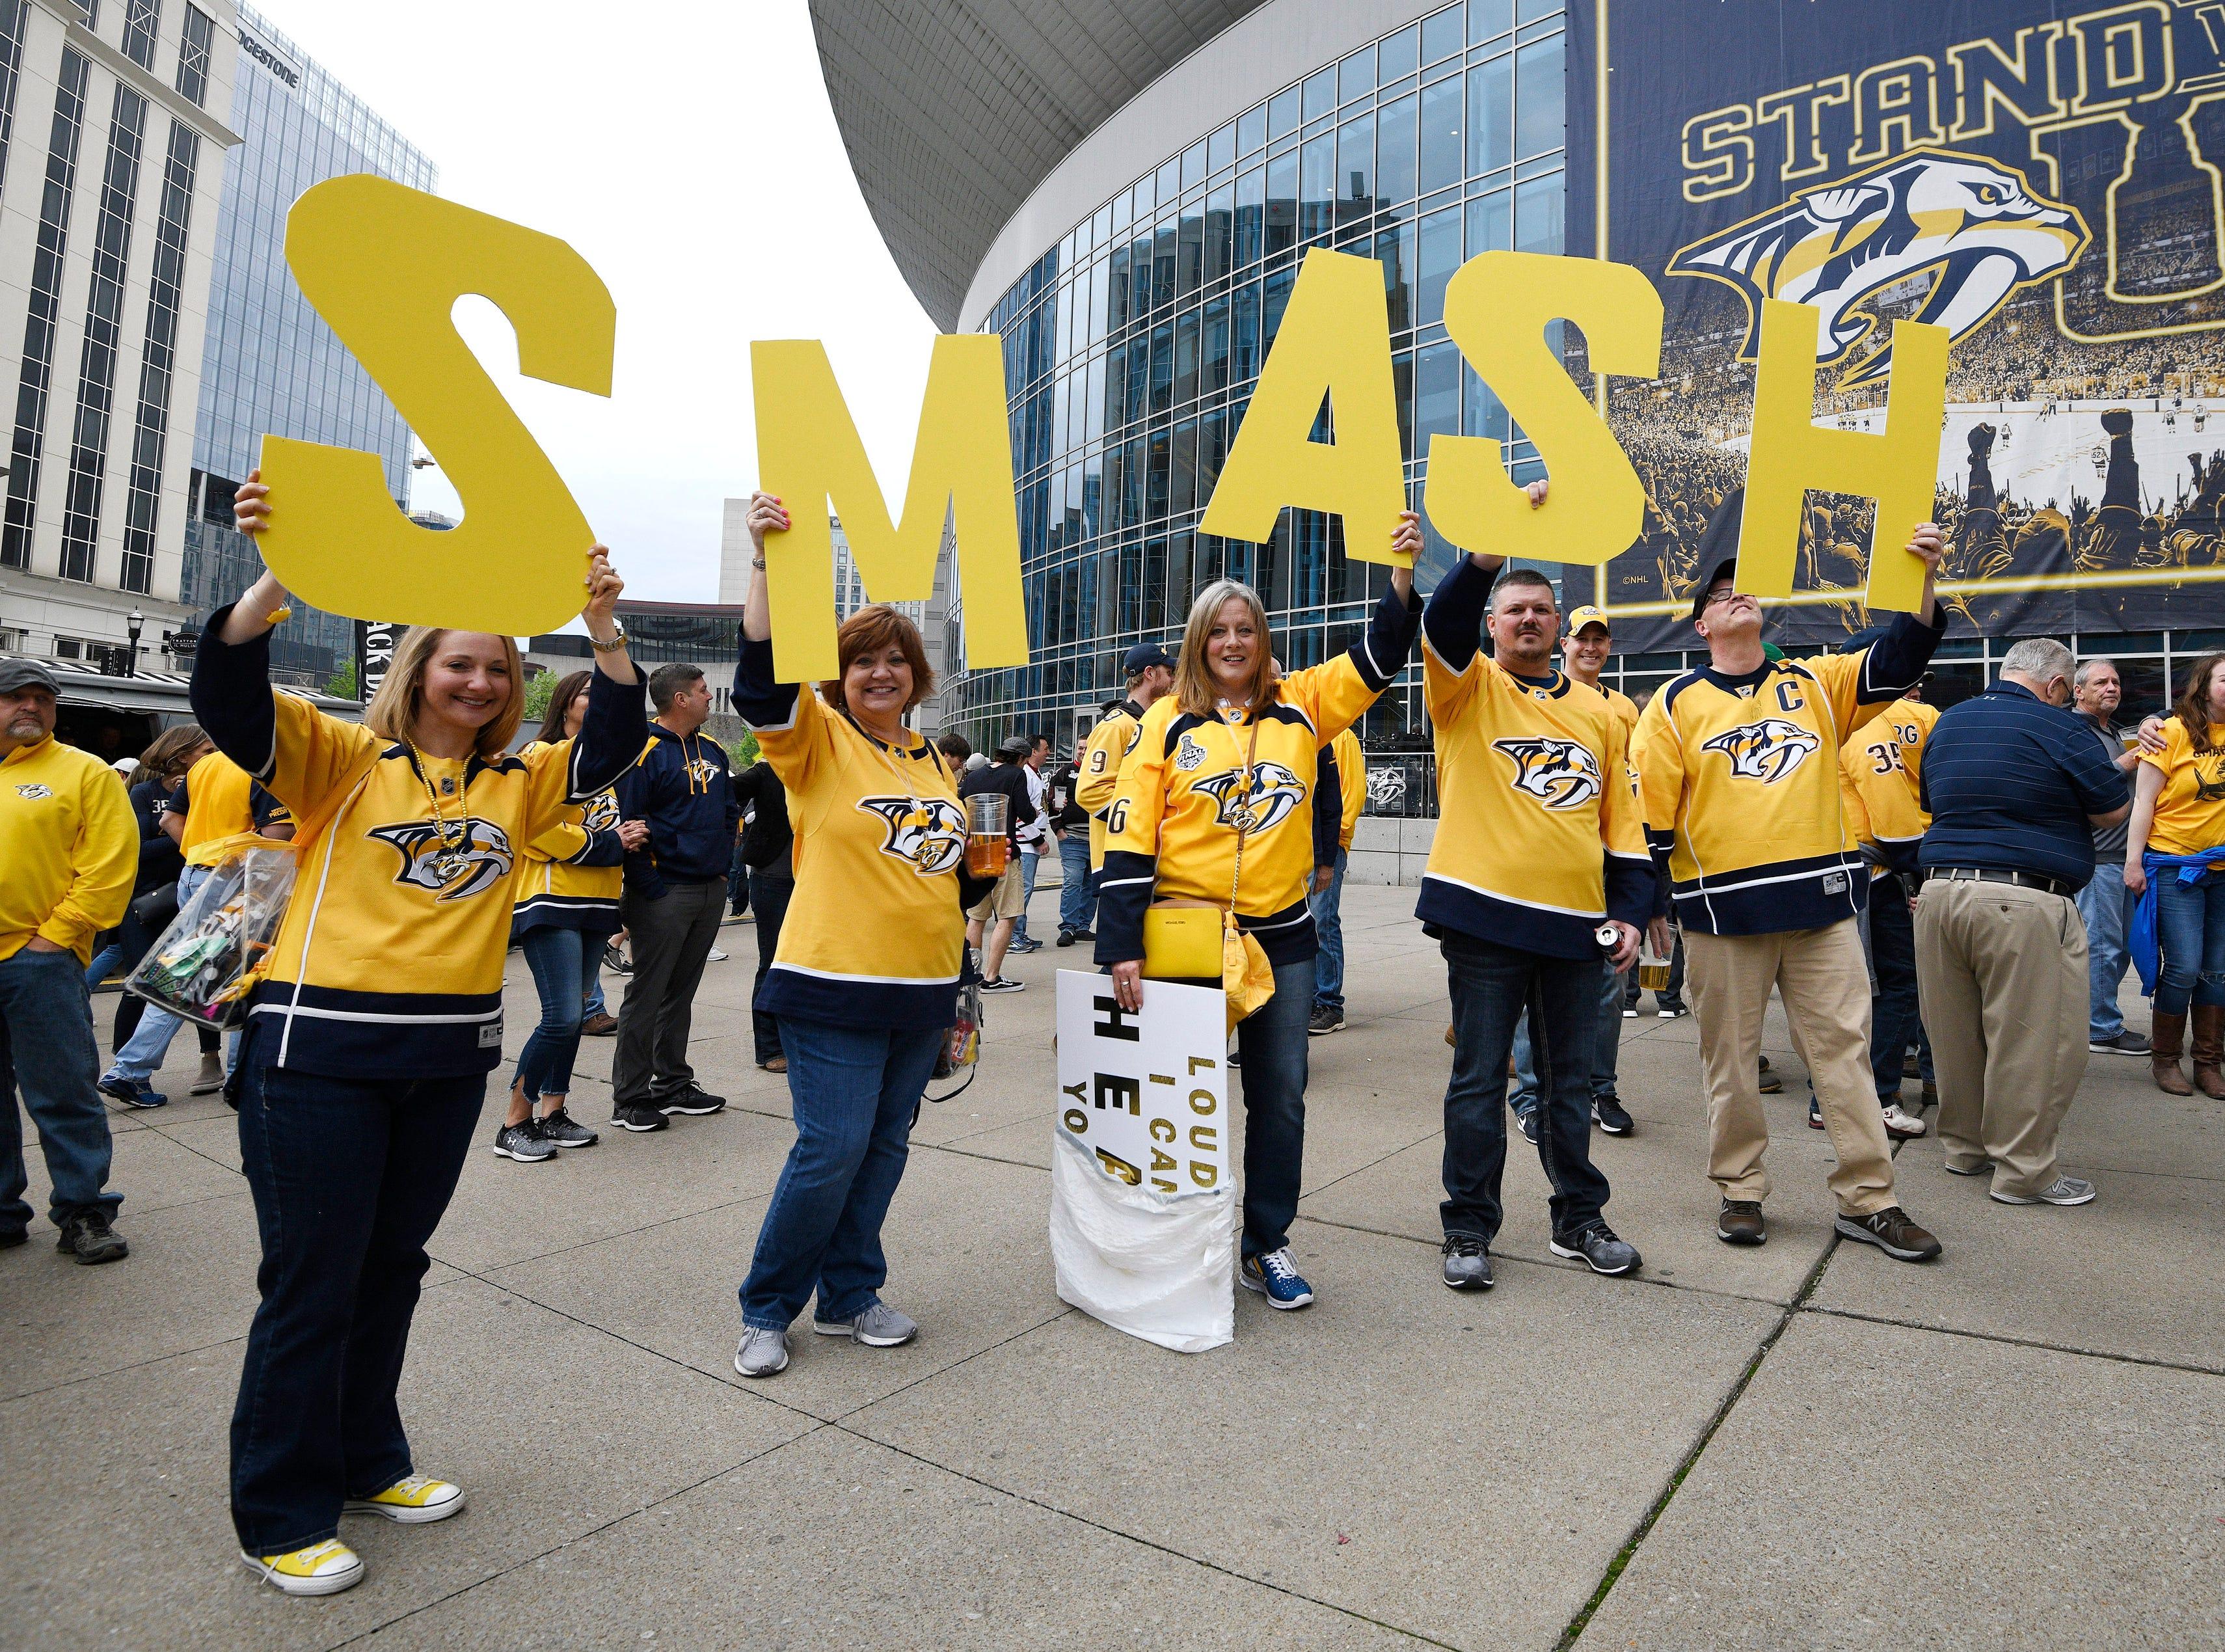 Fans show their Predators spirit before the divisional semifinal game against Dallas at Bridgestone Arena in Nashville, Tenn., Saturday, April 13, 2019.